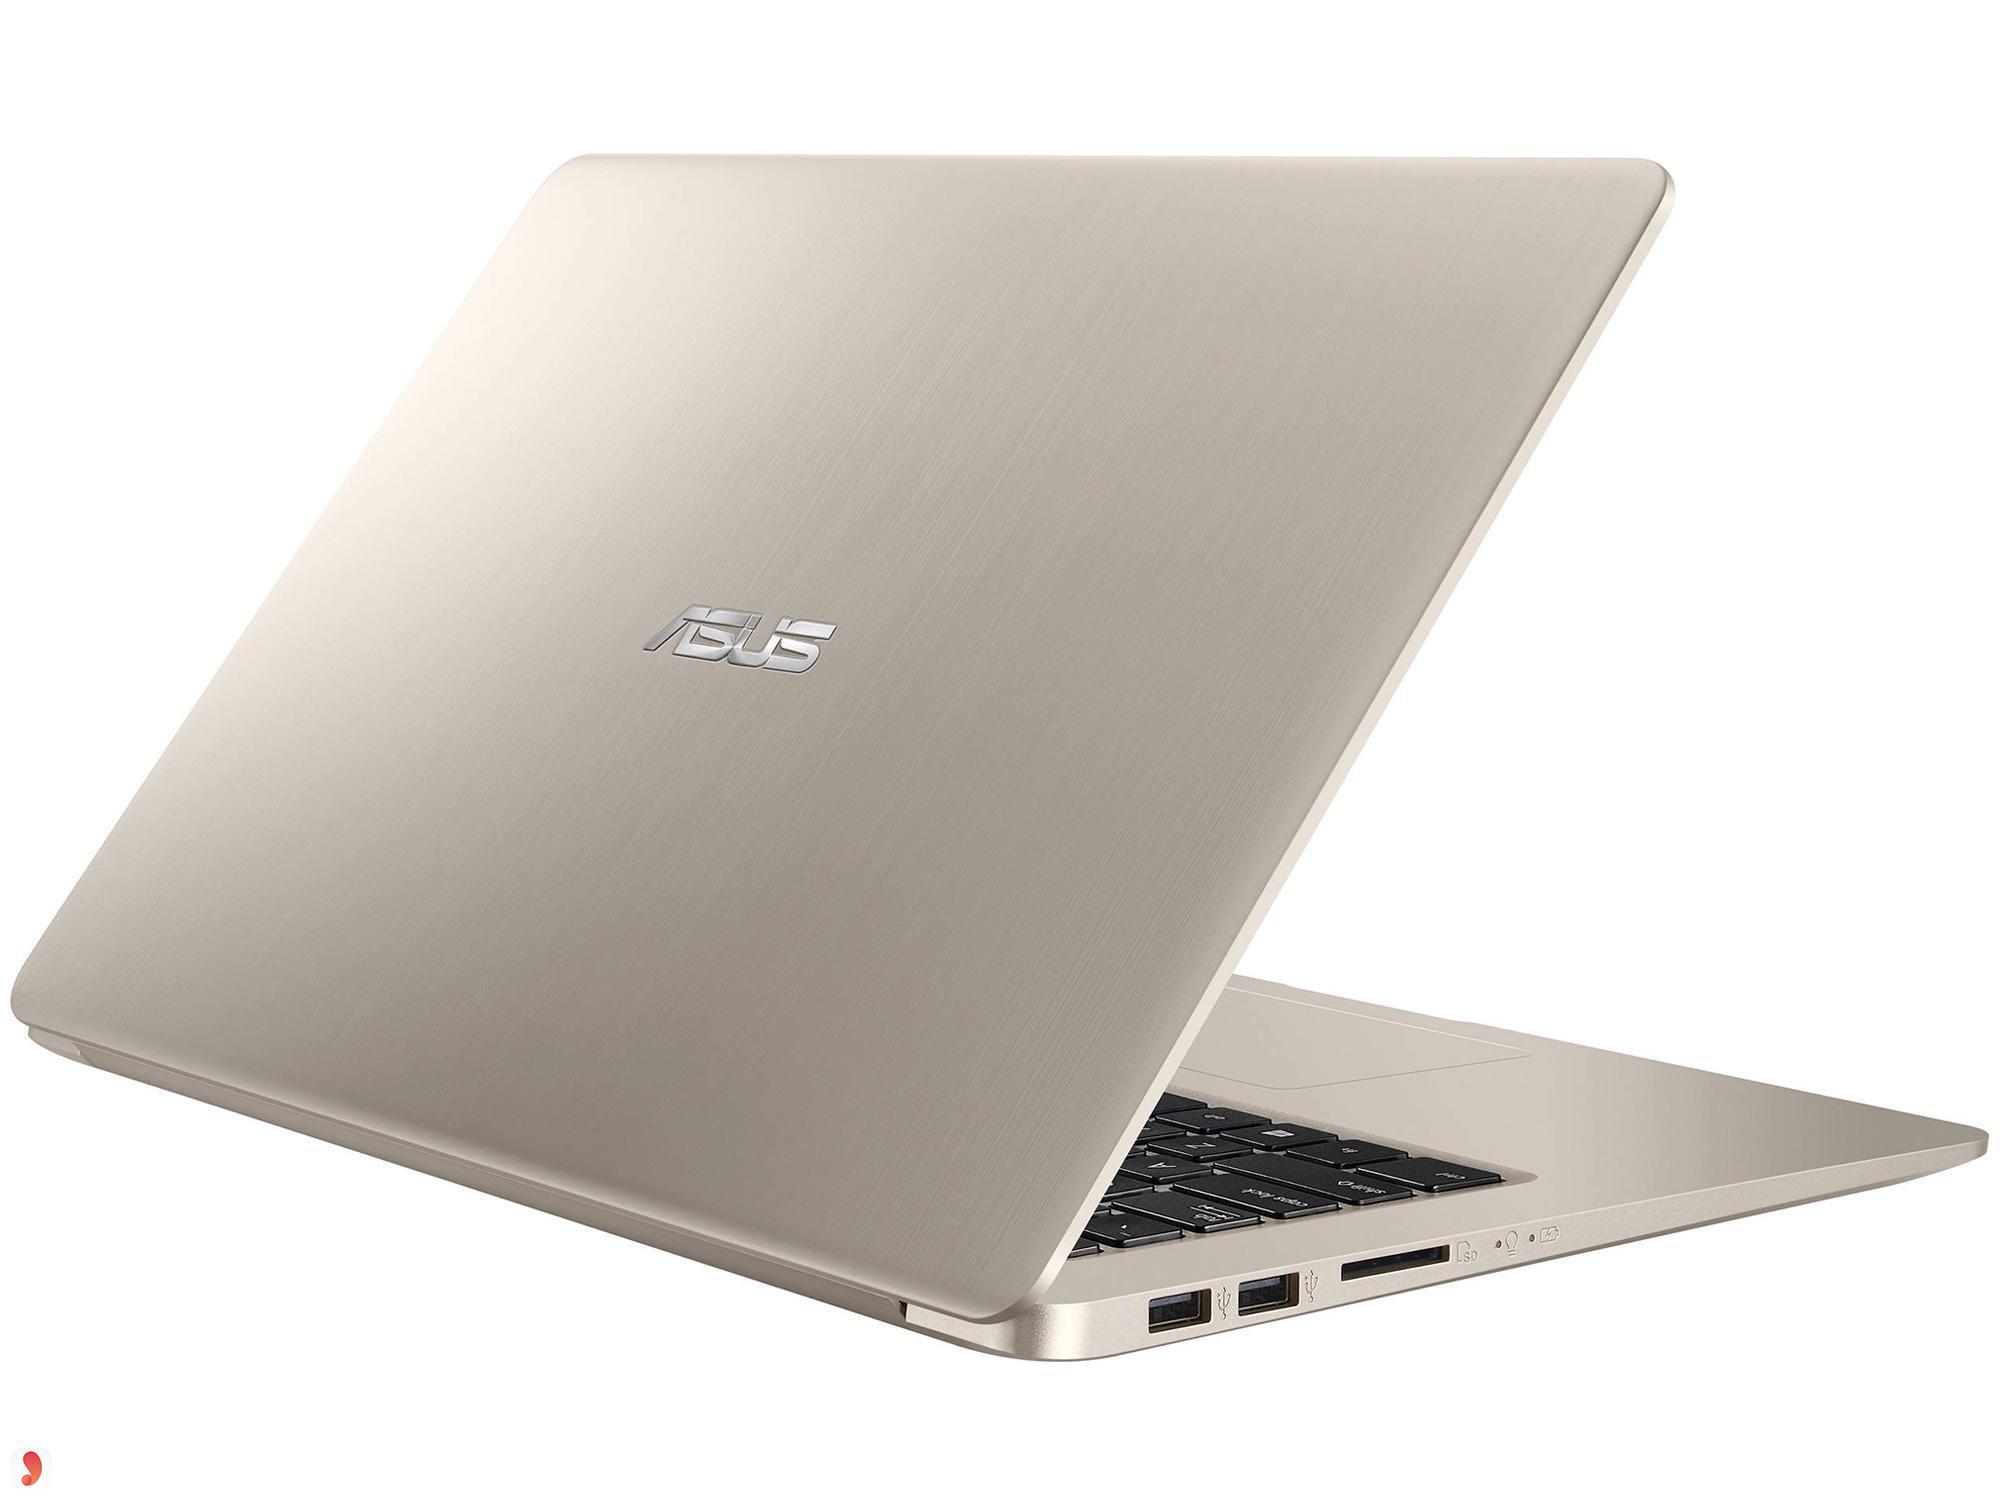 Laptop Asus Vivobook A411UA-BV445T cổng kết nối